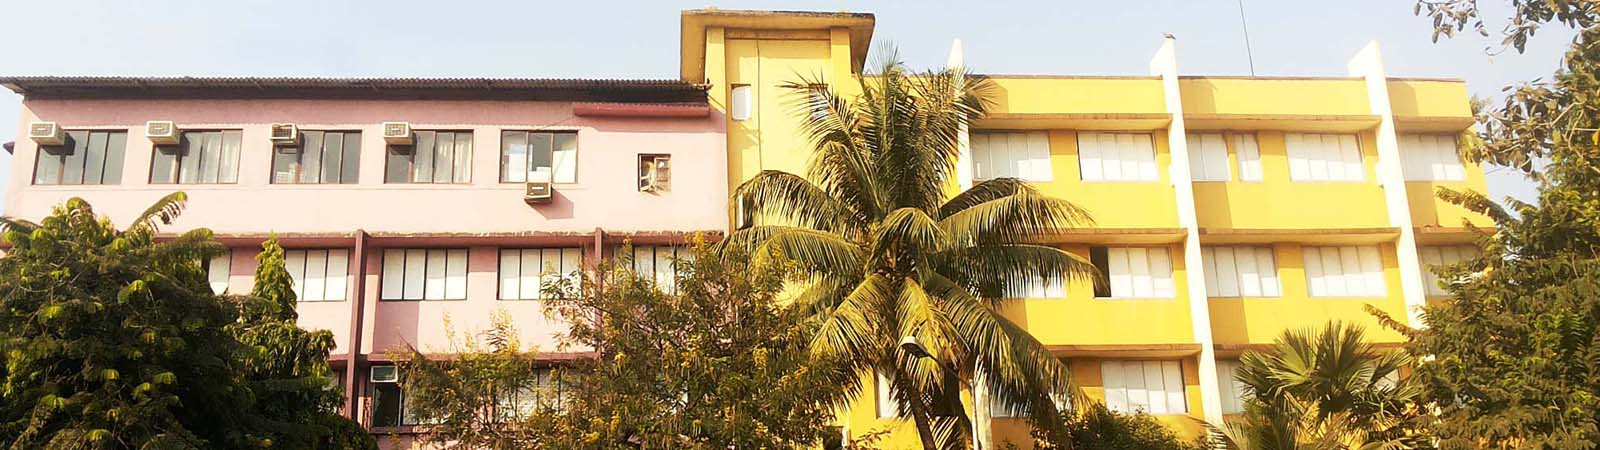 Akbar Peerbhoy College Of Commerce And Economics, Mumbai